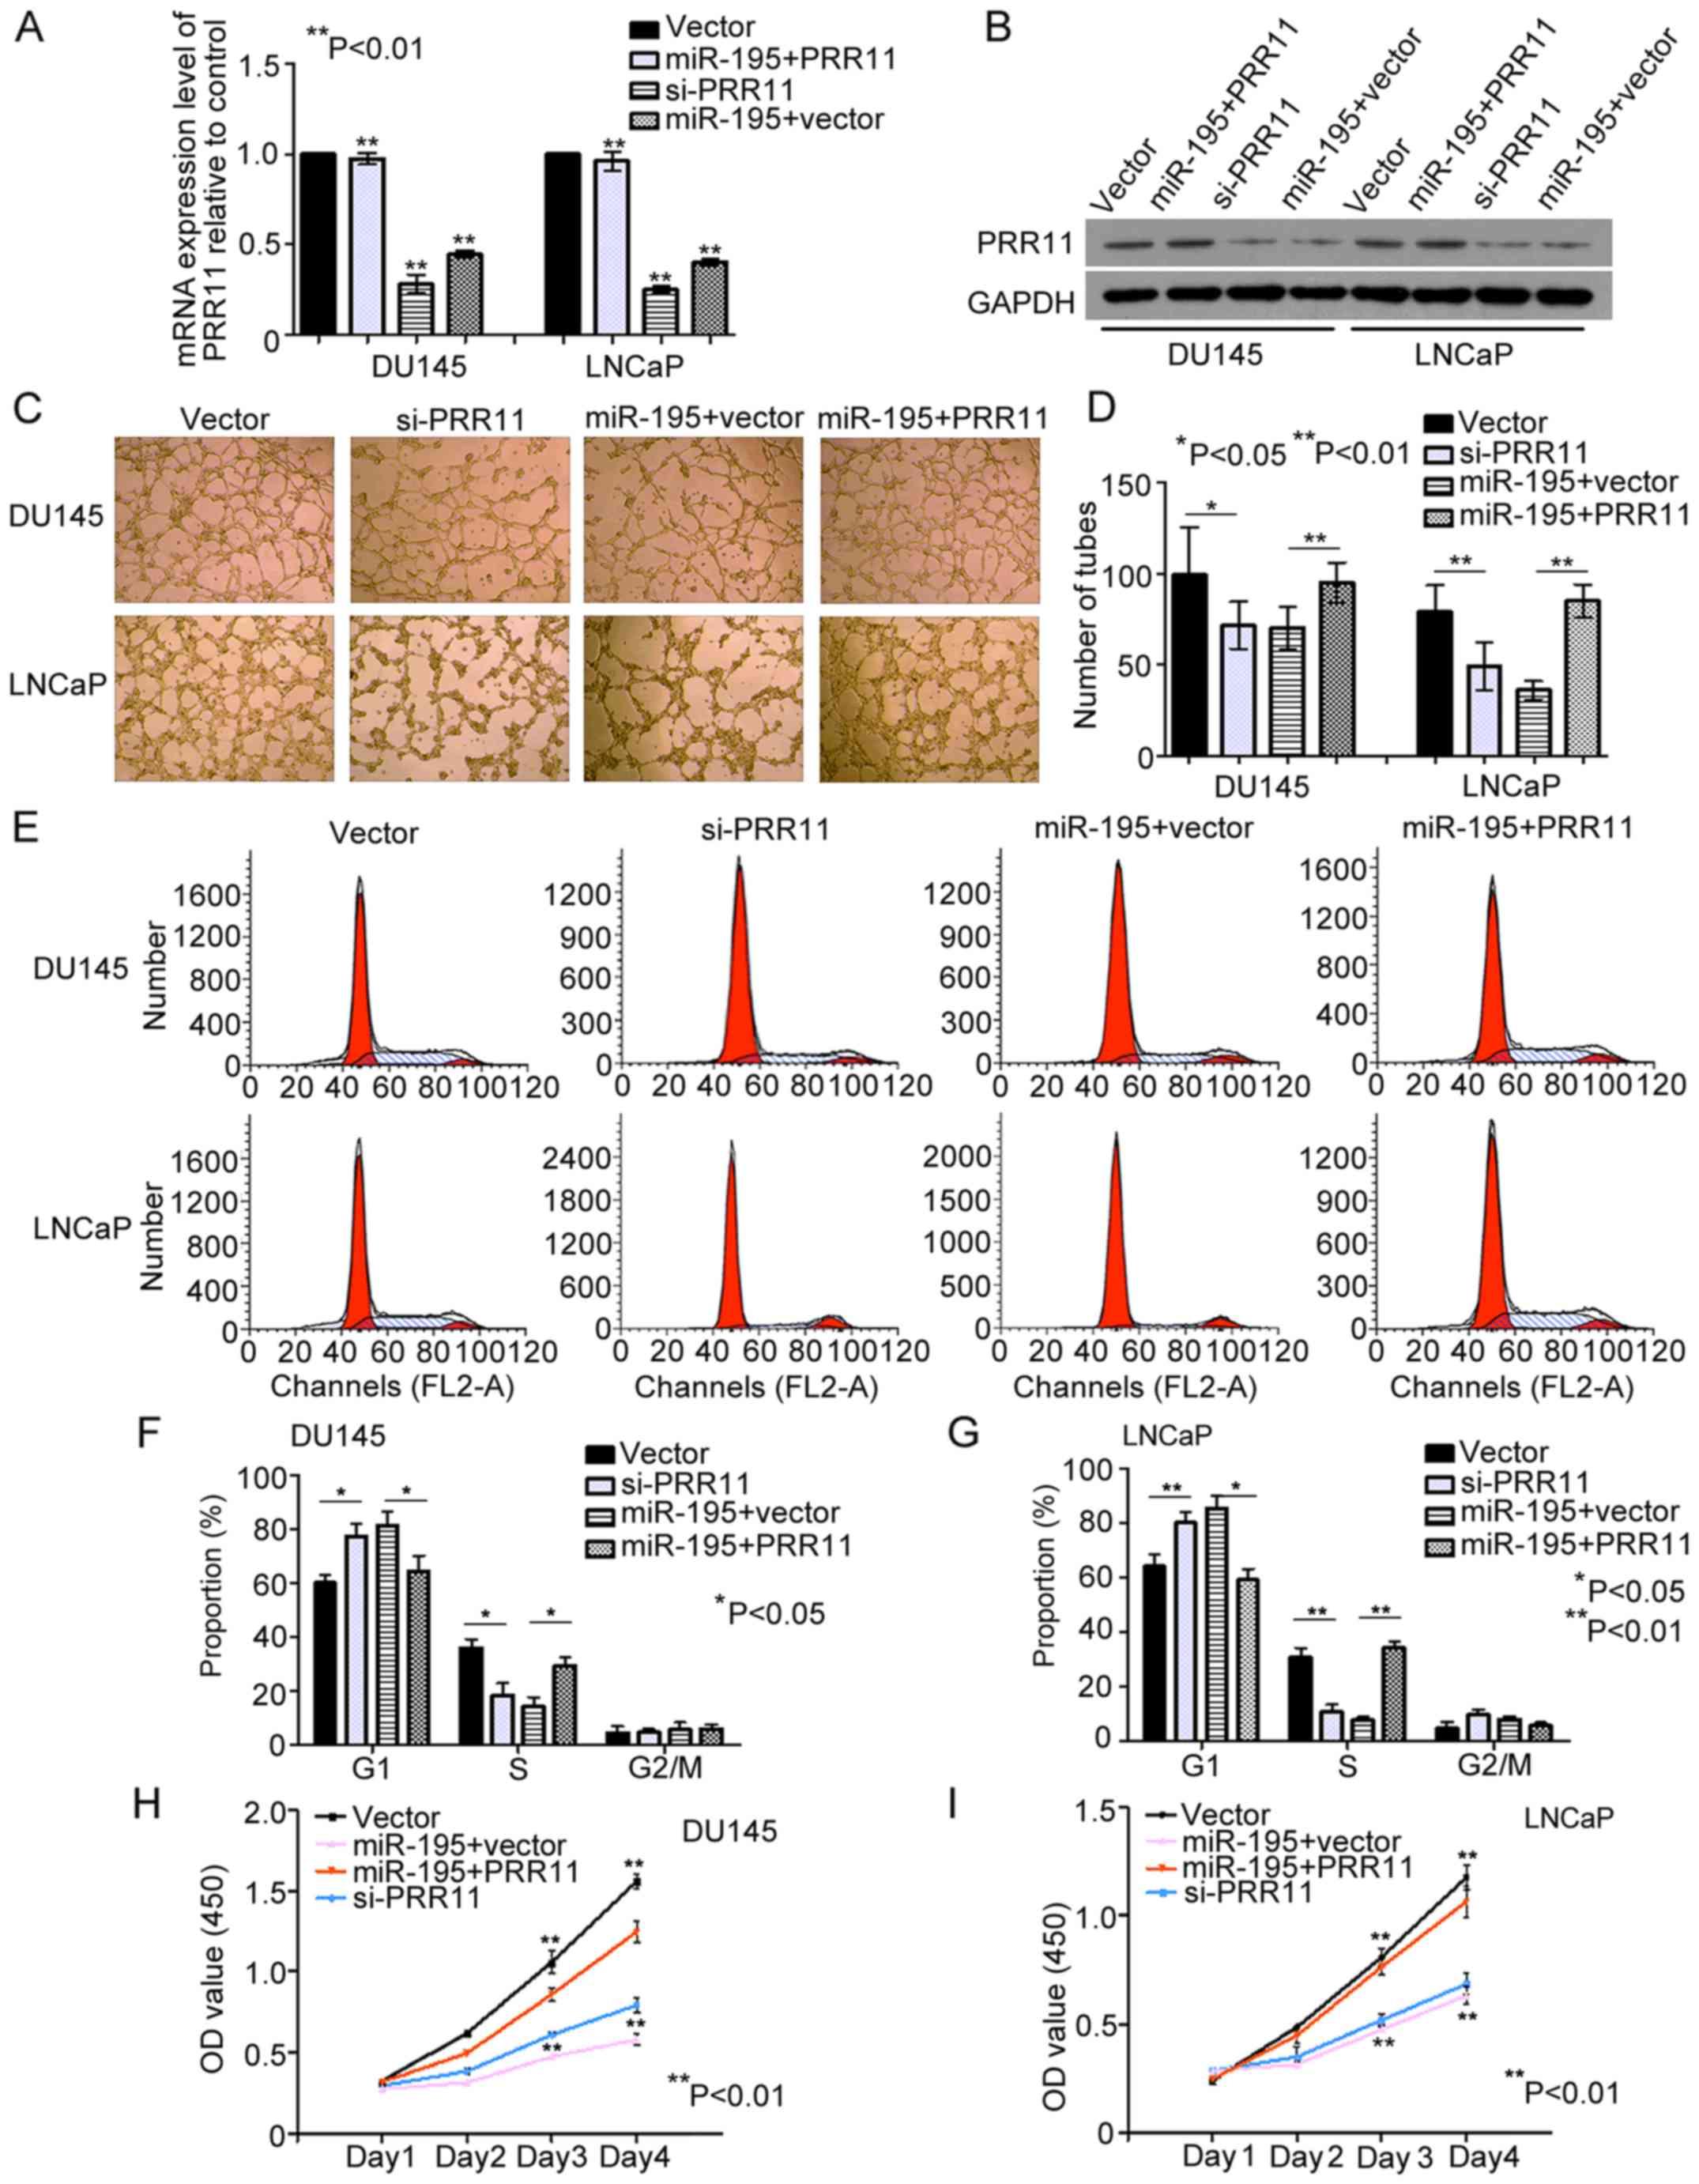 hsa-miR-195-5p inhibits cell proliferation of human